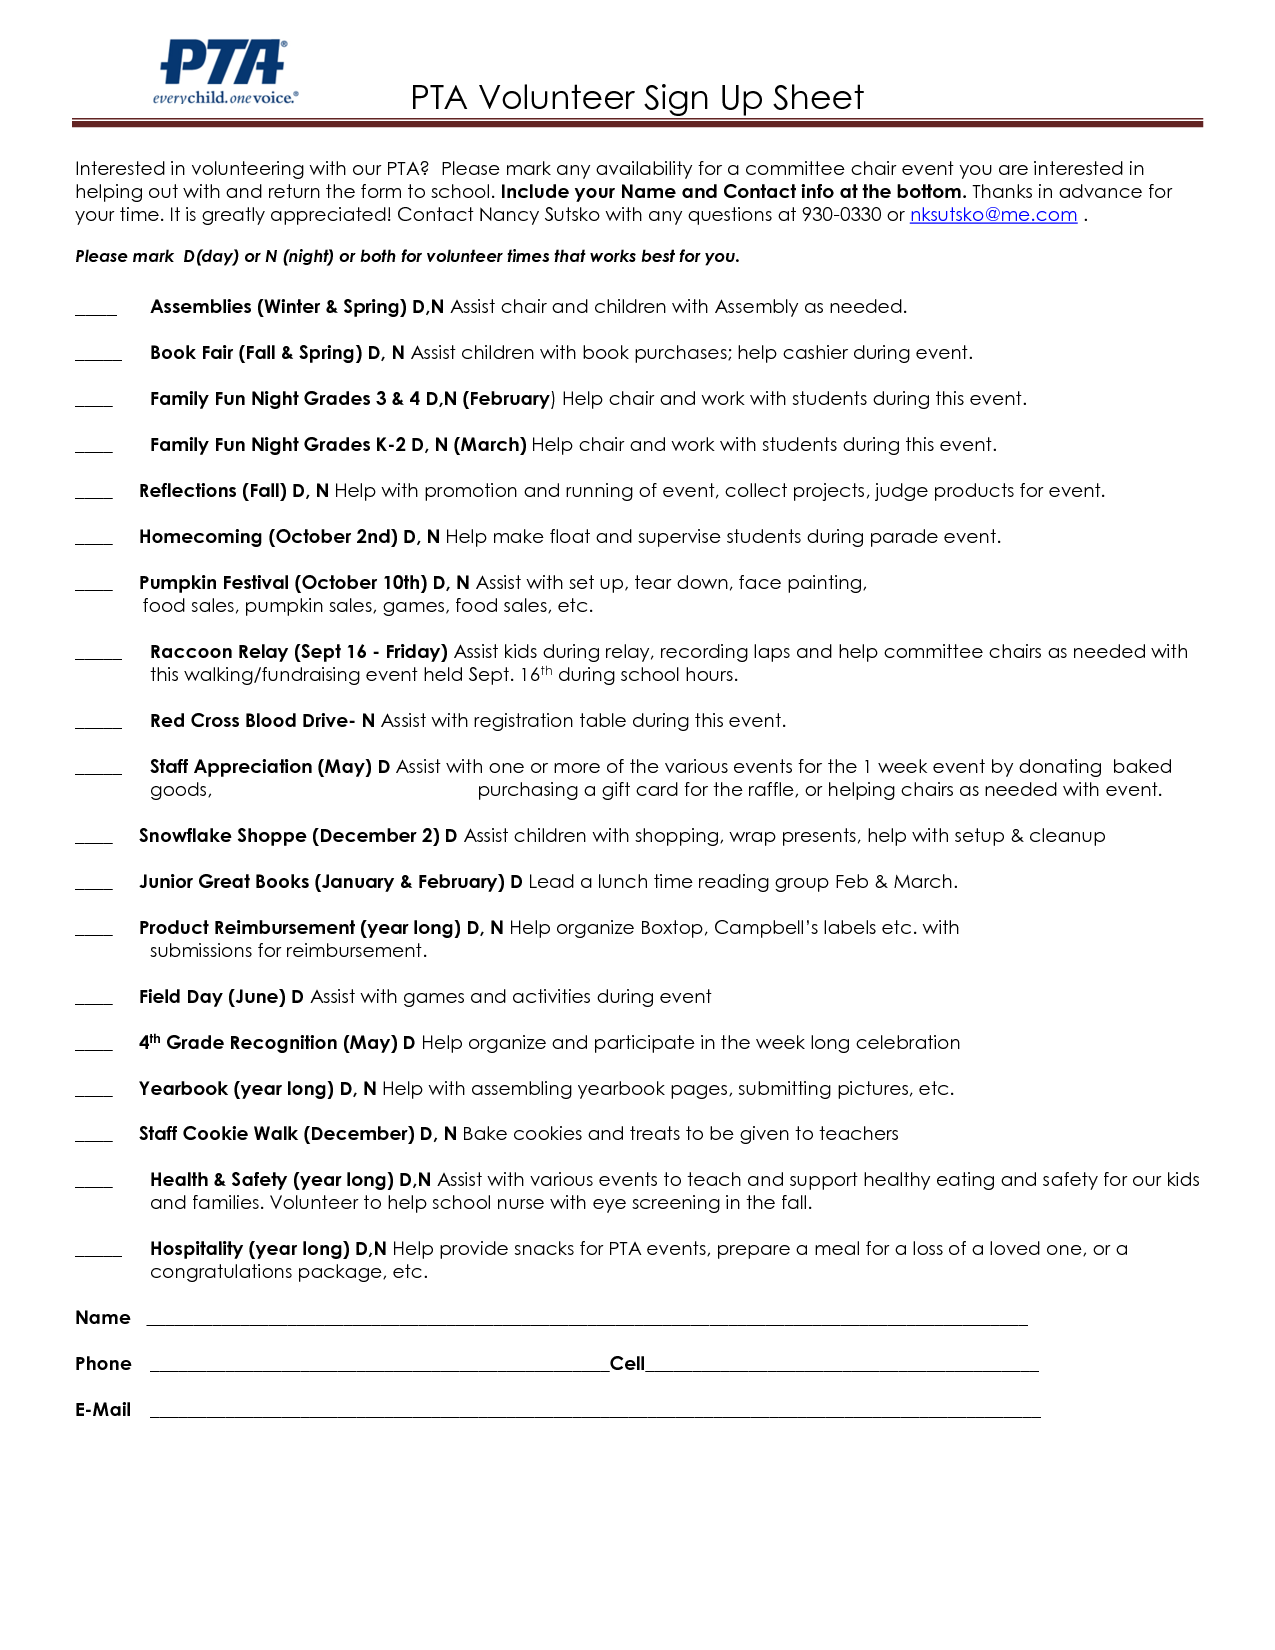 volunteer sheets